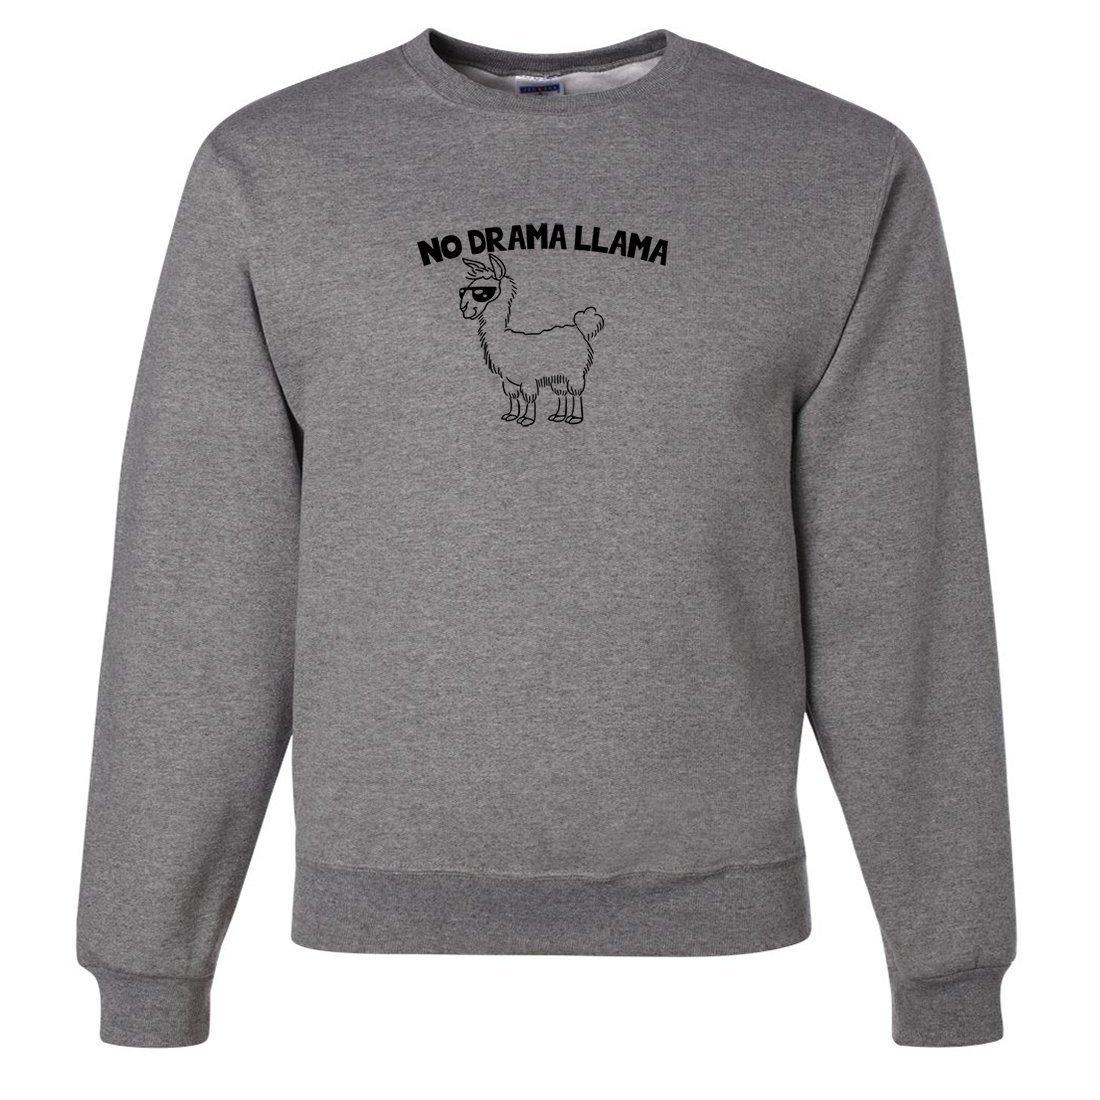 Oxford XXLarge Dolphin Shirt Co No Drama Llama Crewneck Sweatshirt